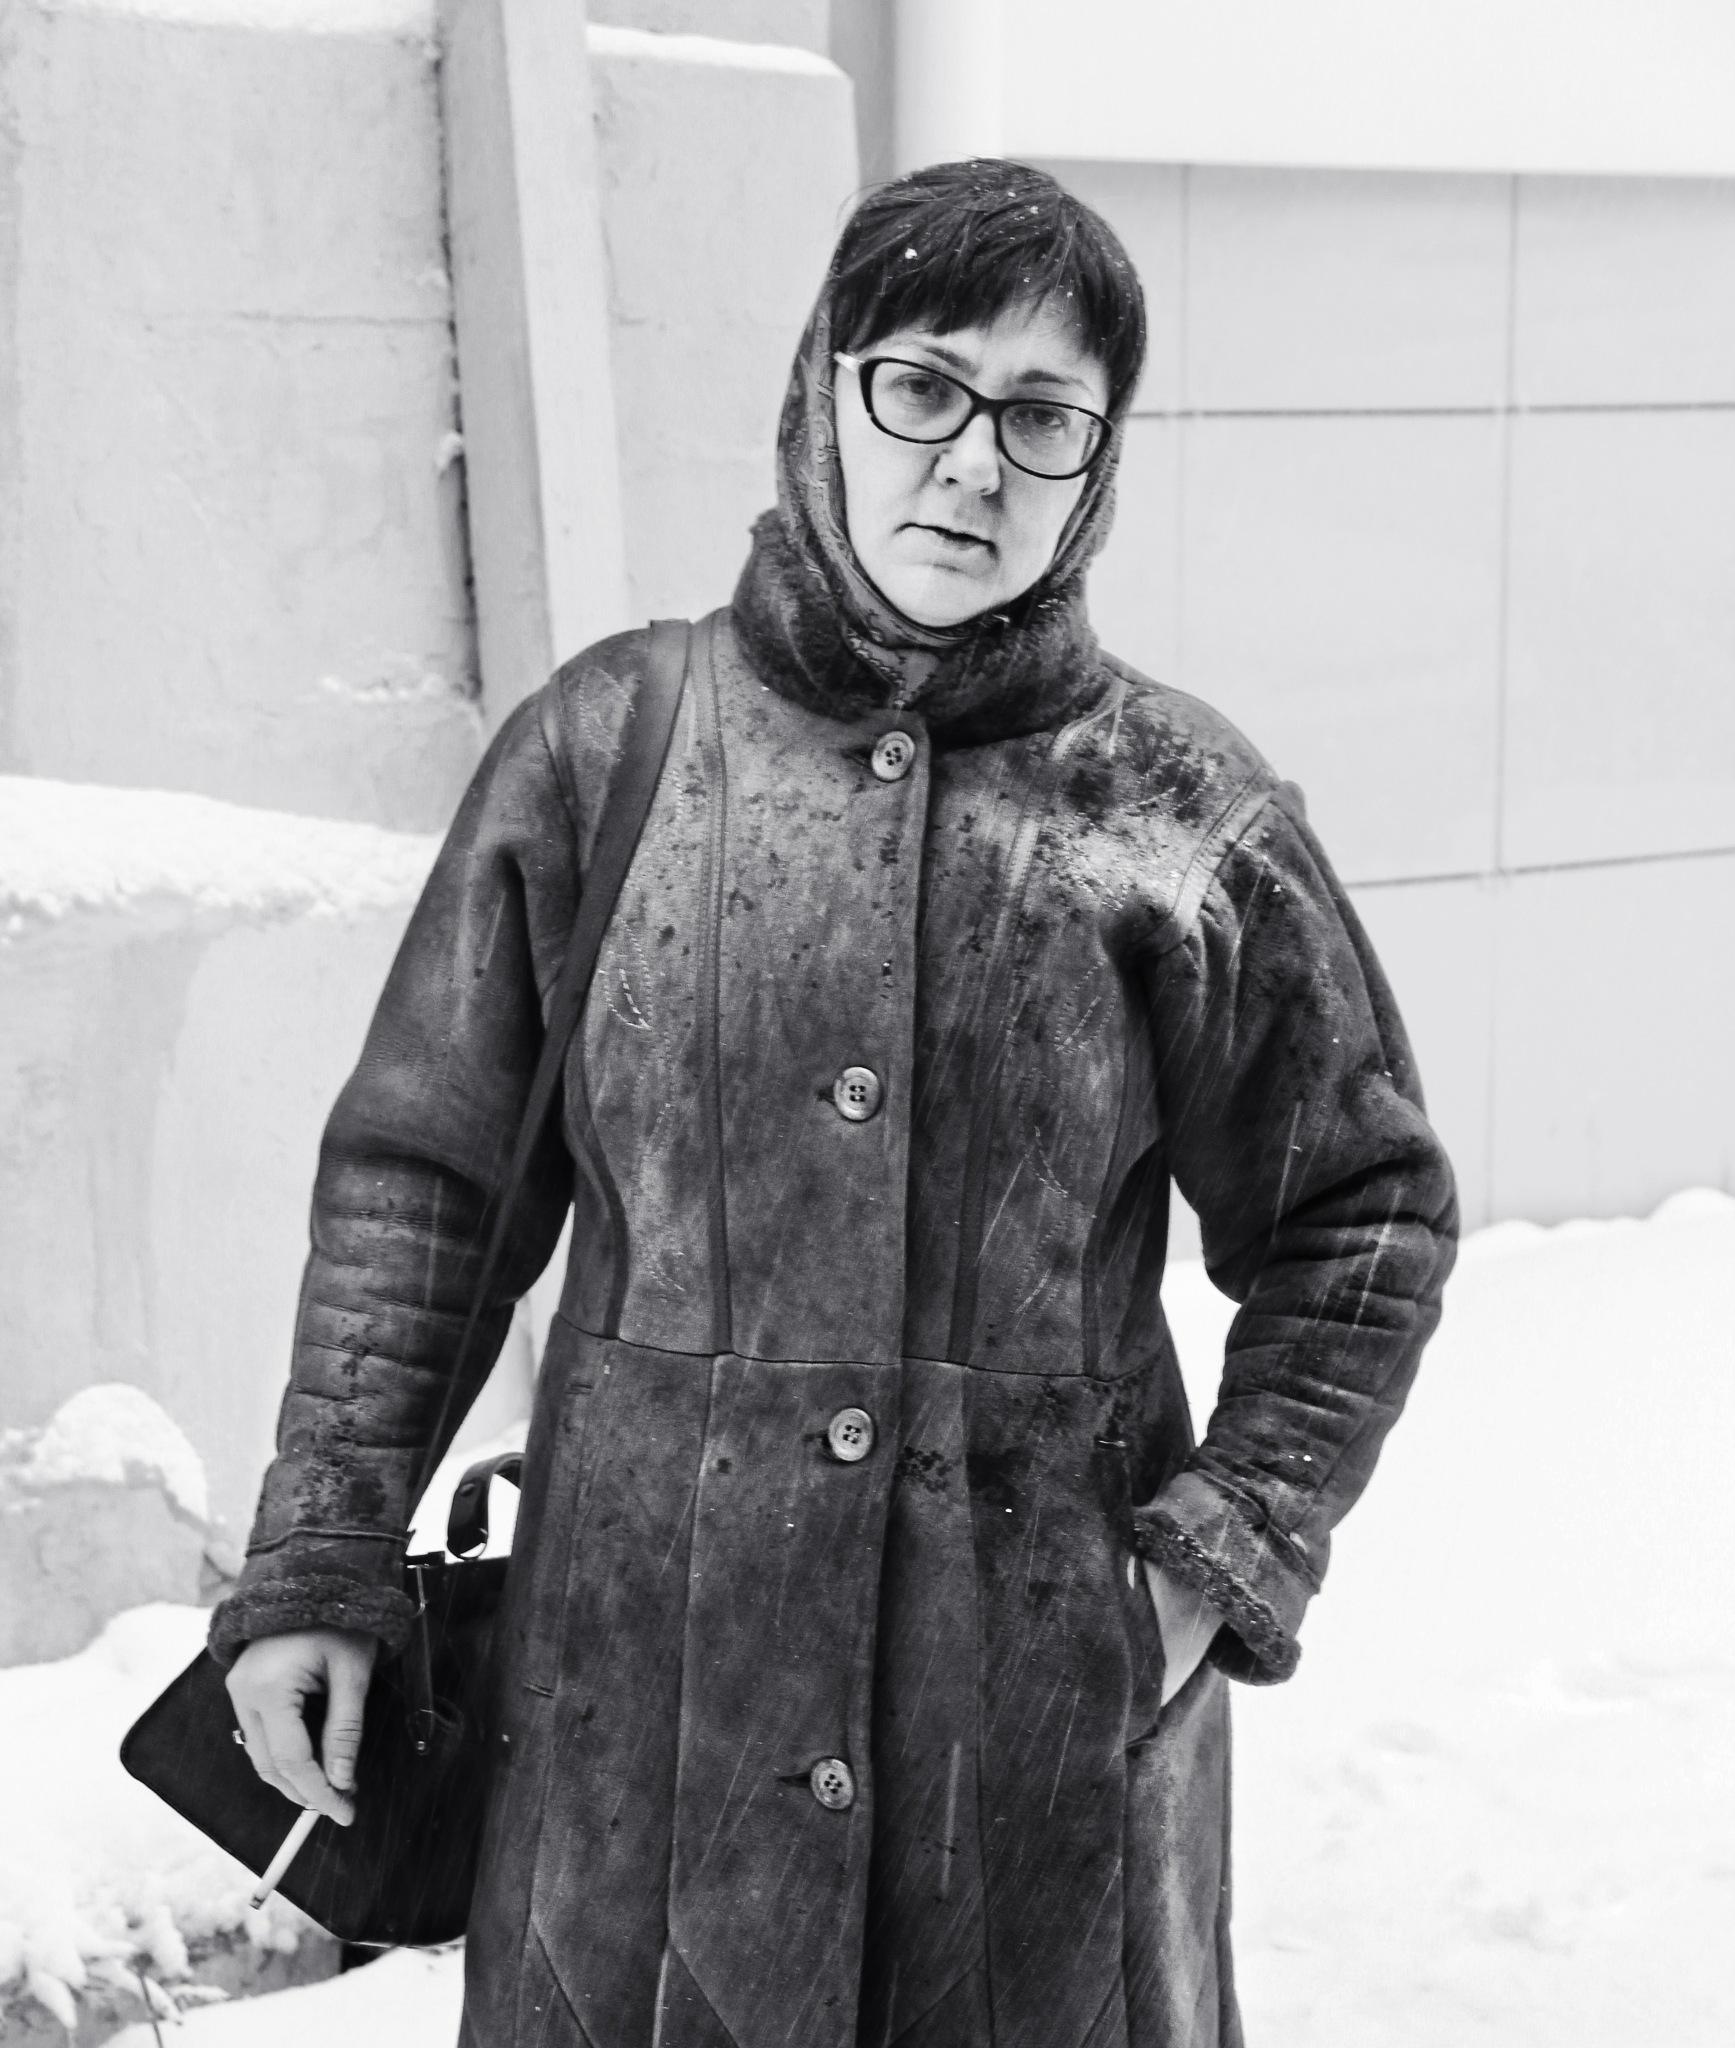 Under snowfall by Сергей Юрьев